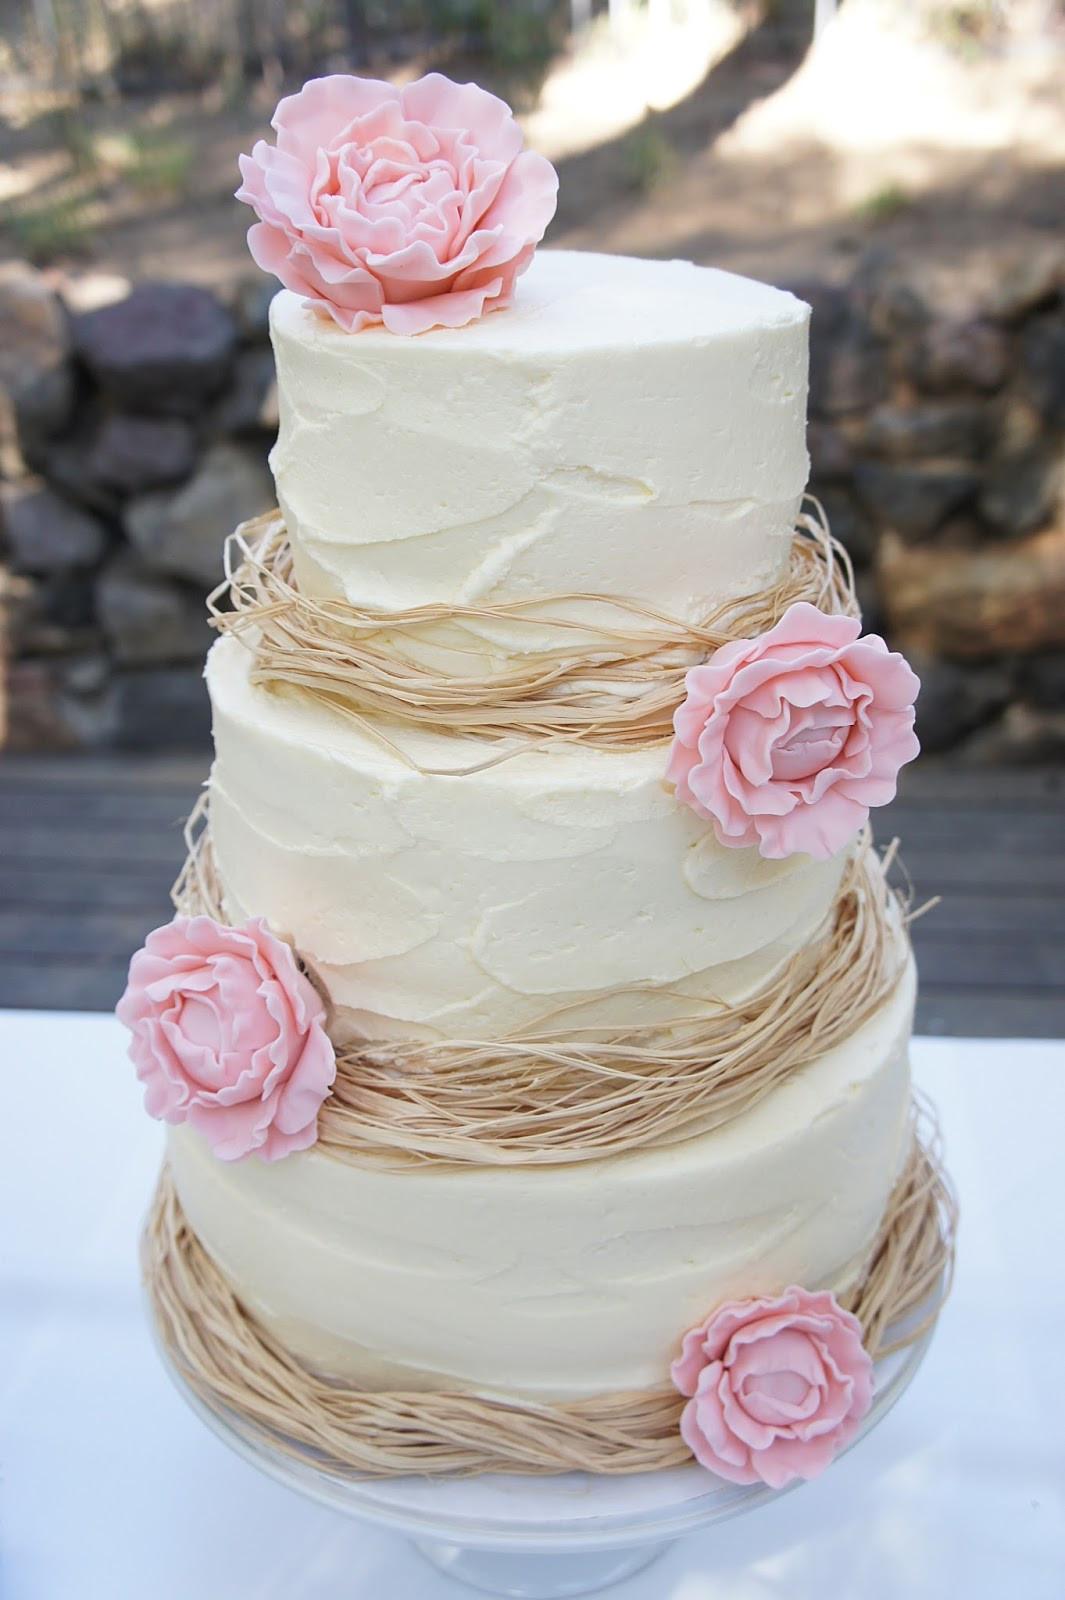 Wedding Cakes Decorated  Raffia Decorated Wedding Cake Favour This